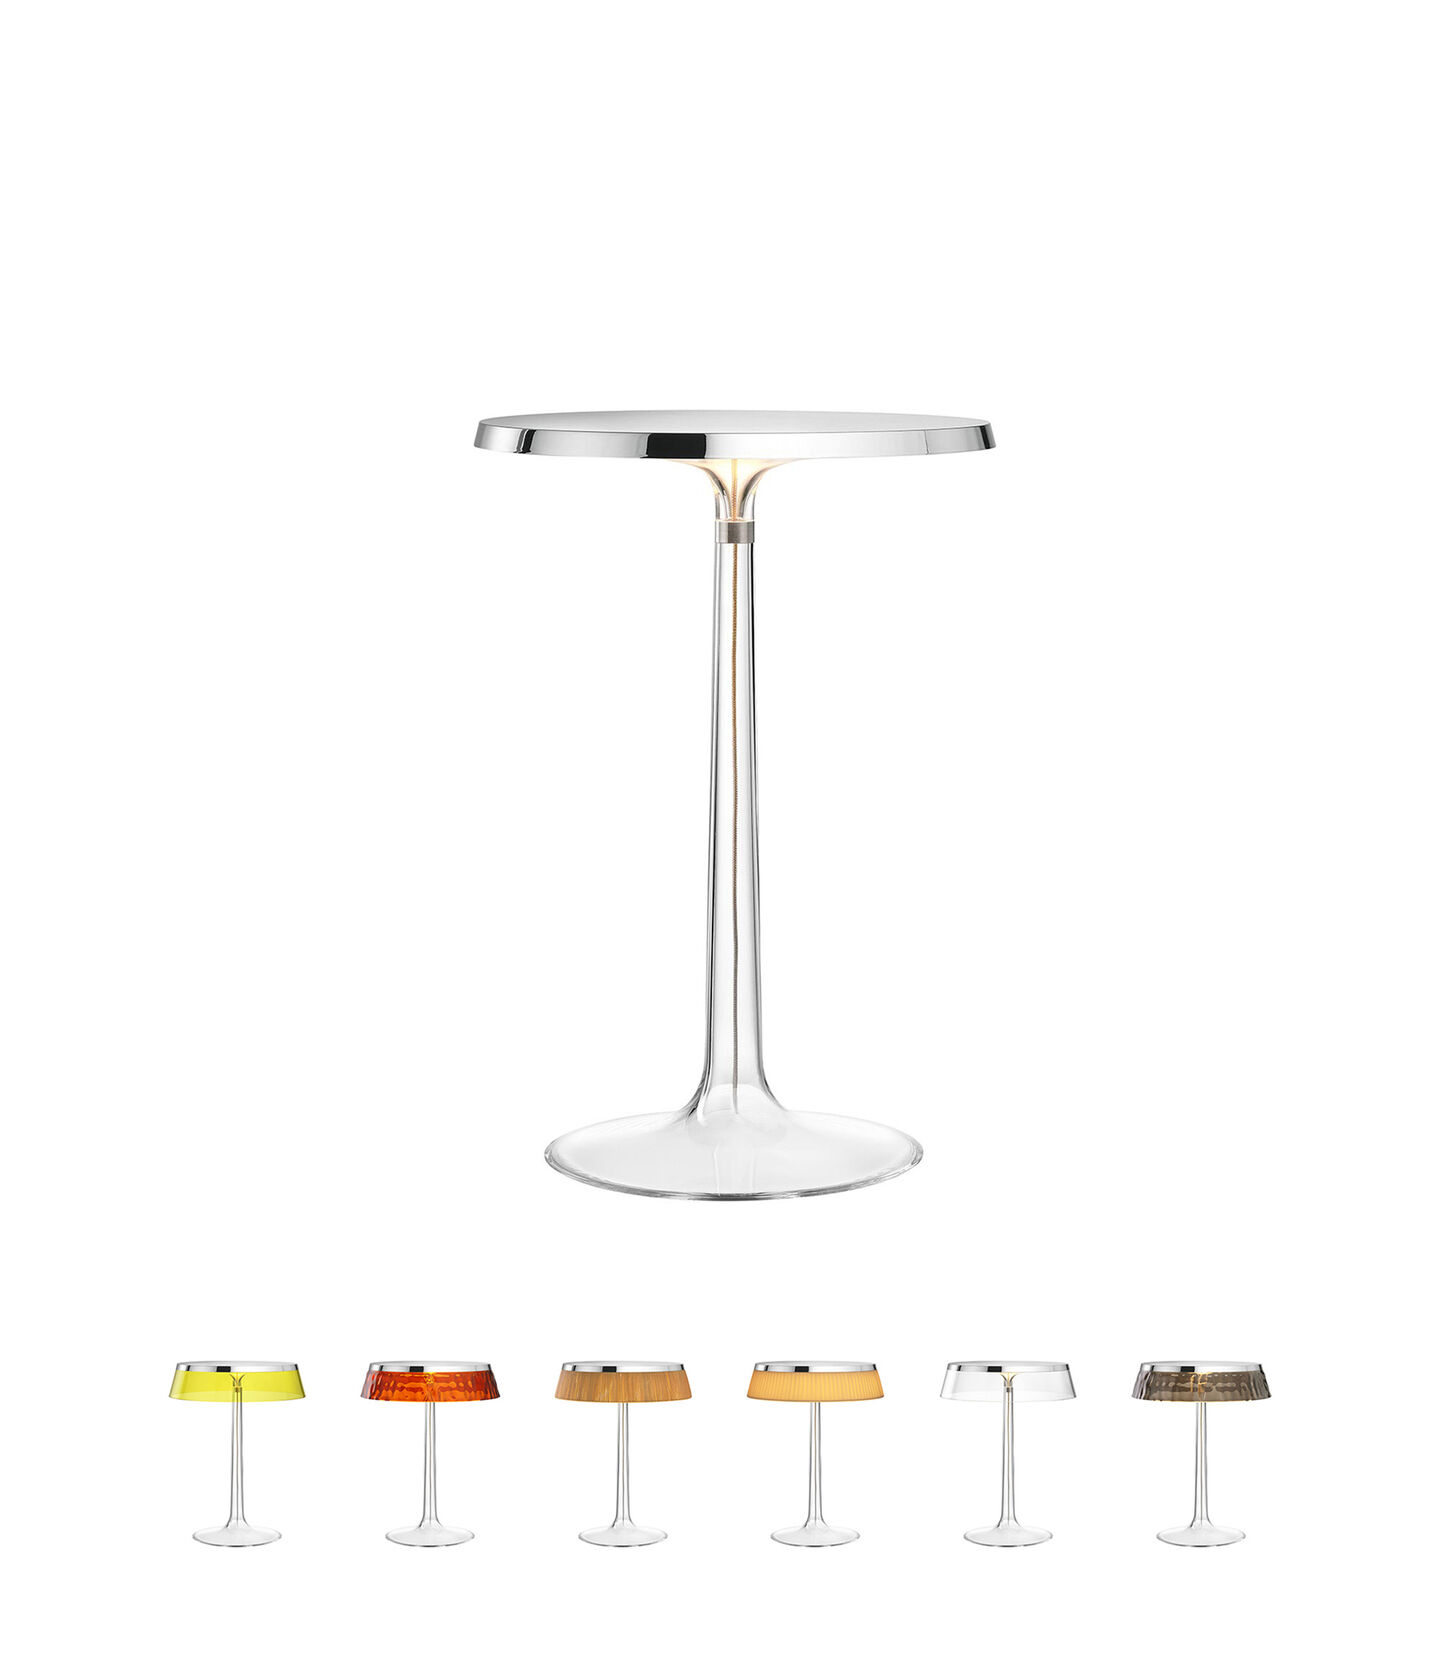 bon-jour-table-starck-flos-F1032057-product-still-life-big